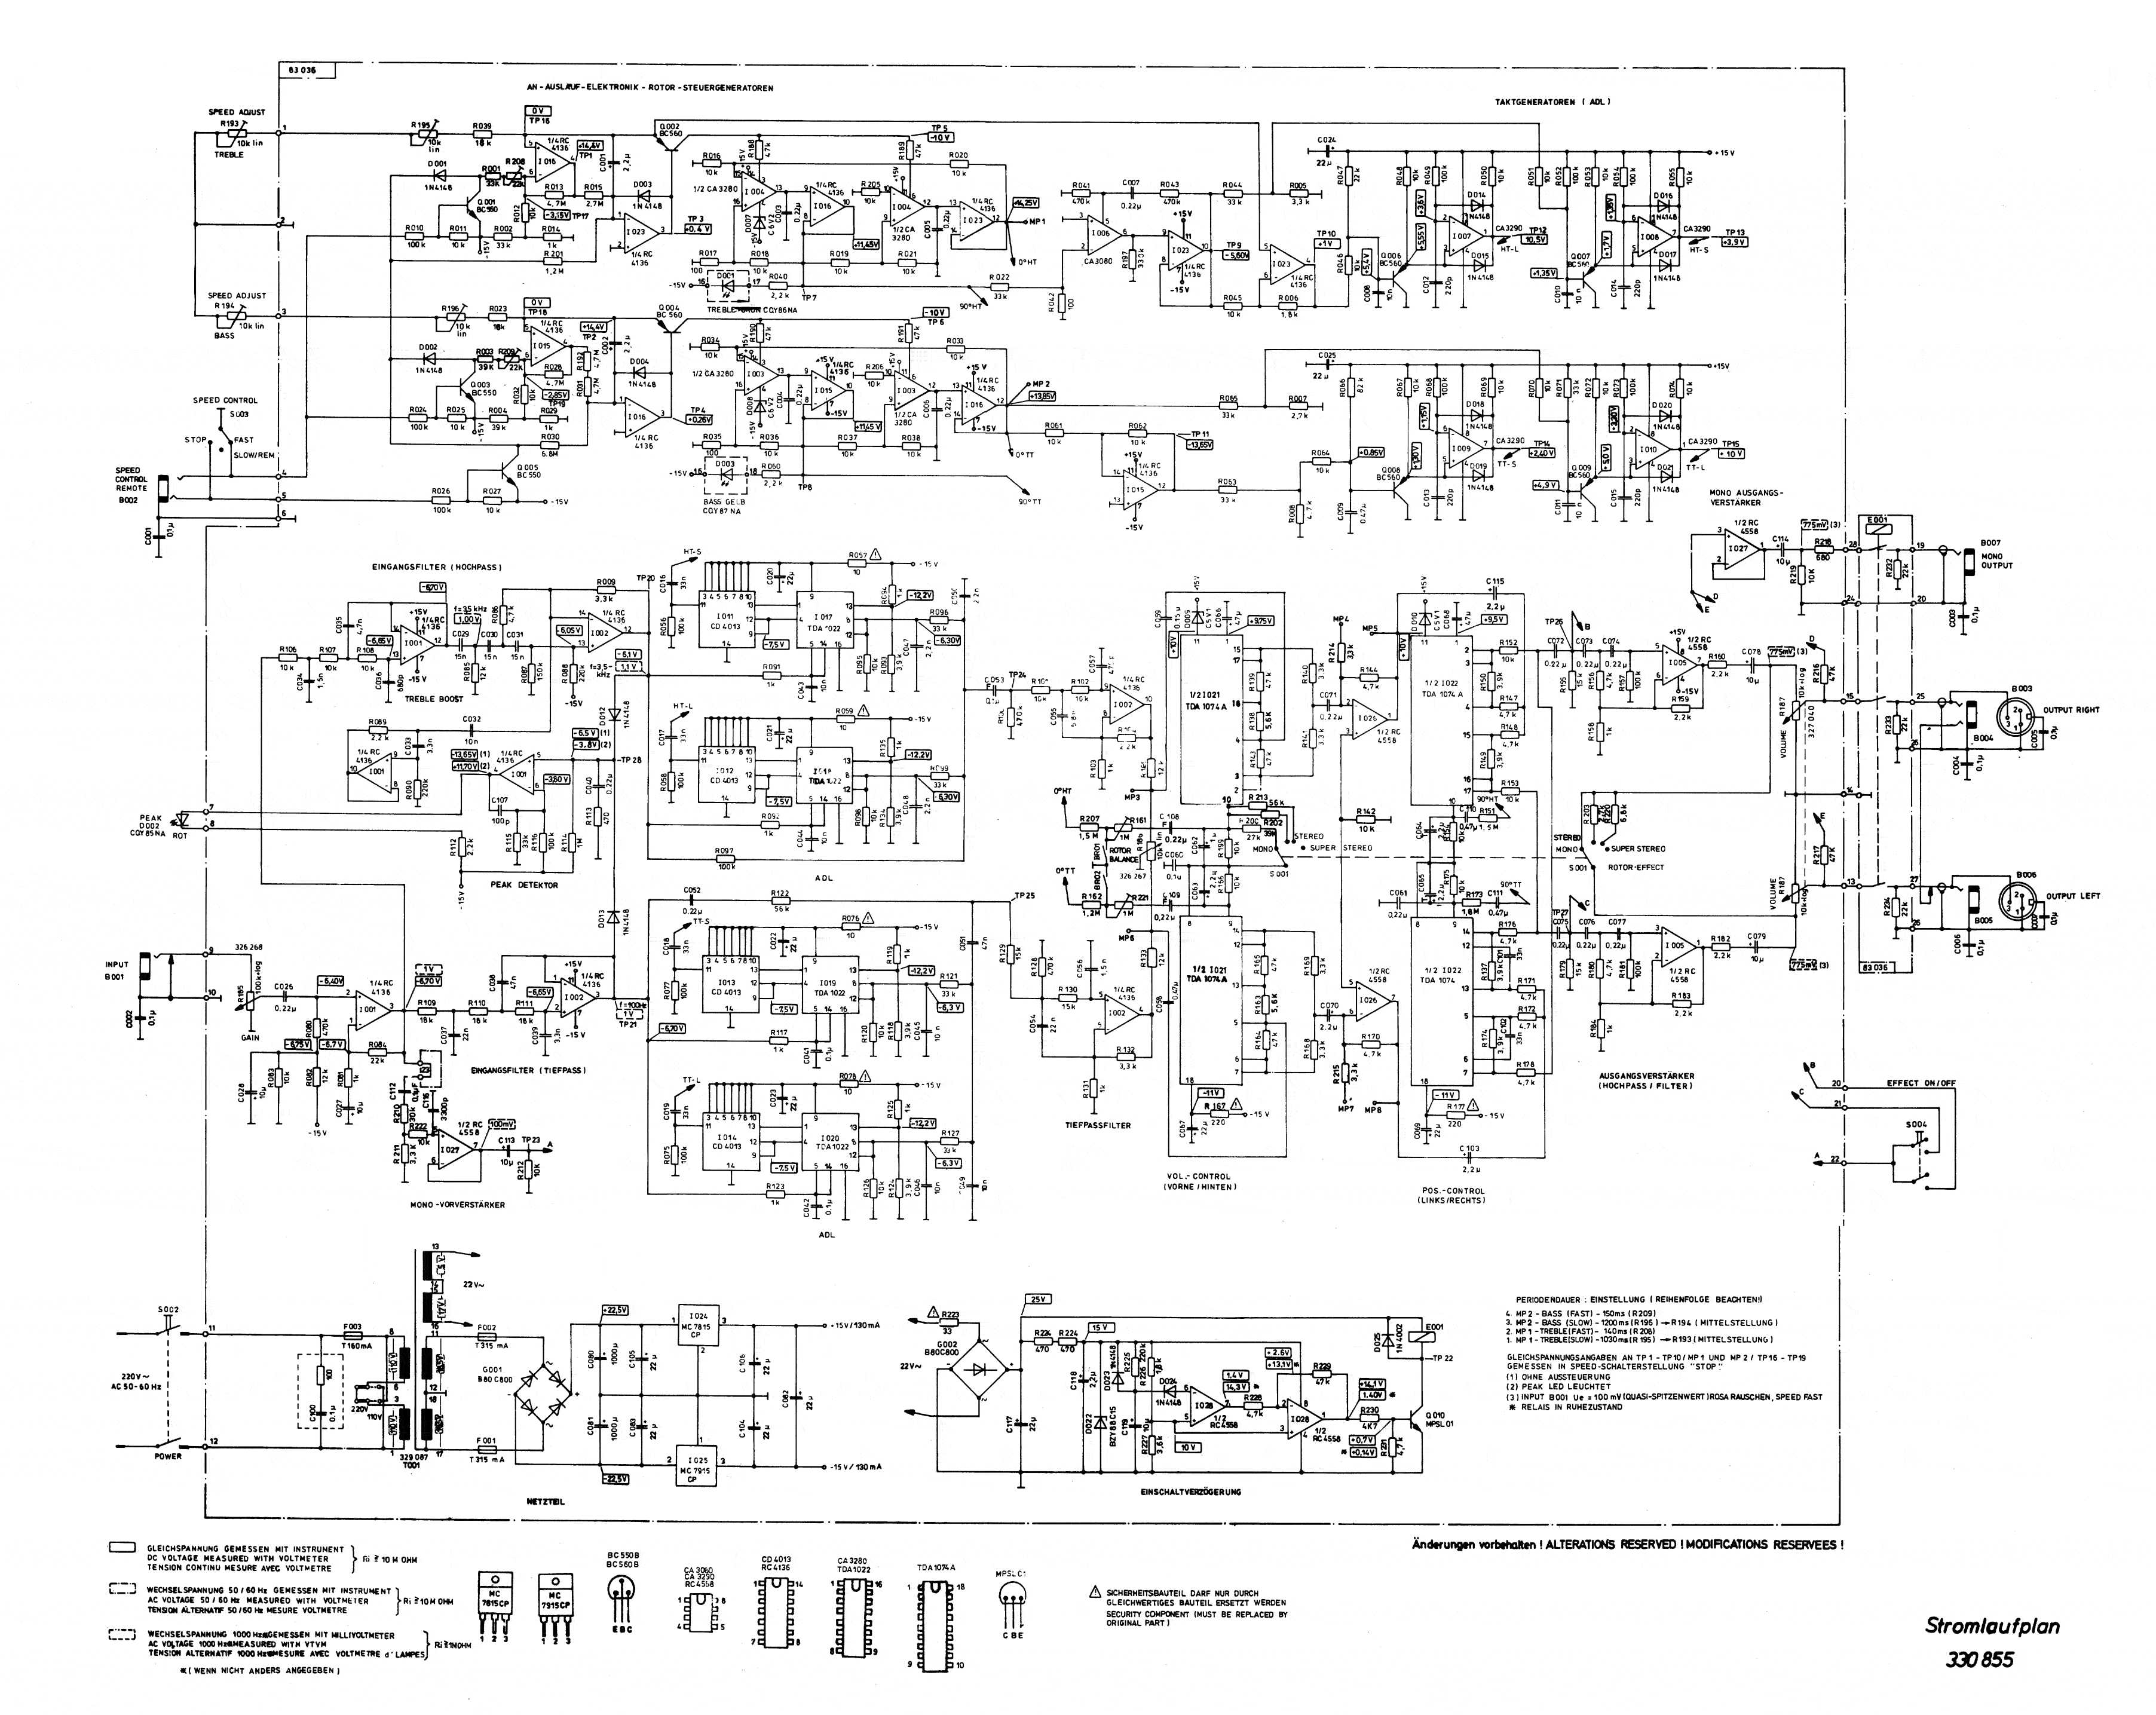 Sp 1000 Speech Synth Schematic Index 208 Amplifier Circuit Diagram Seekiccom